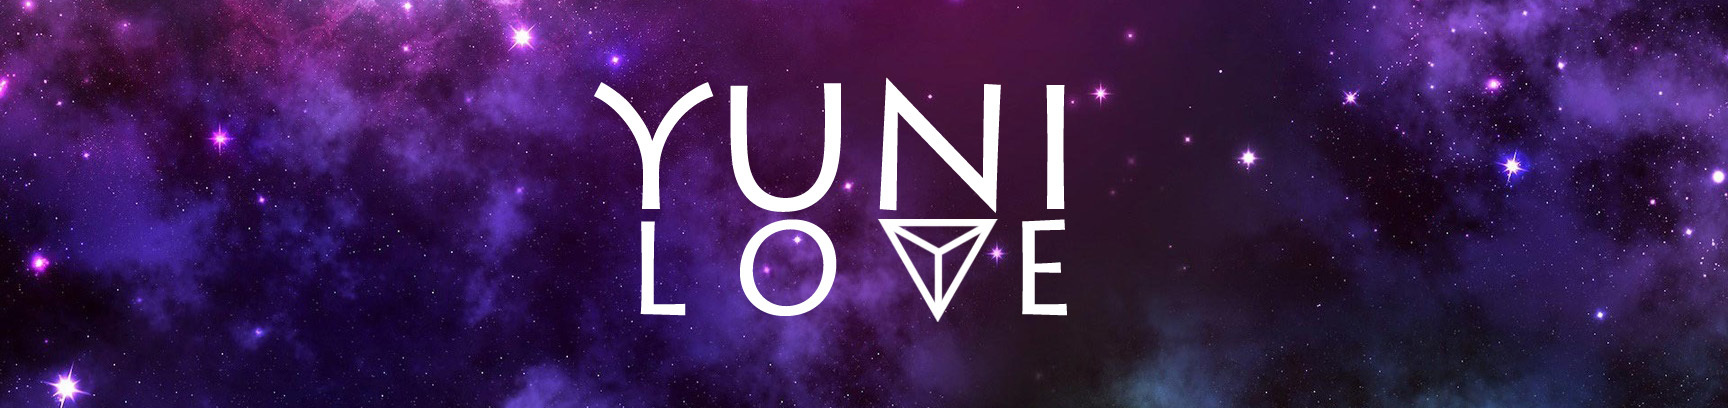 YUNI LOVE Store